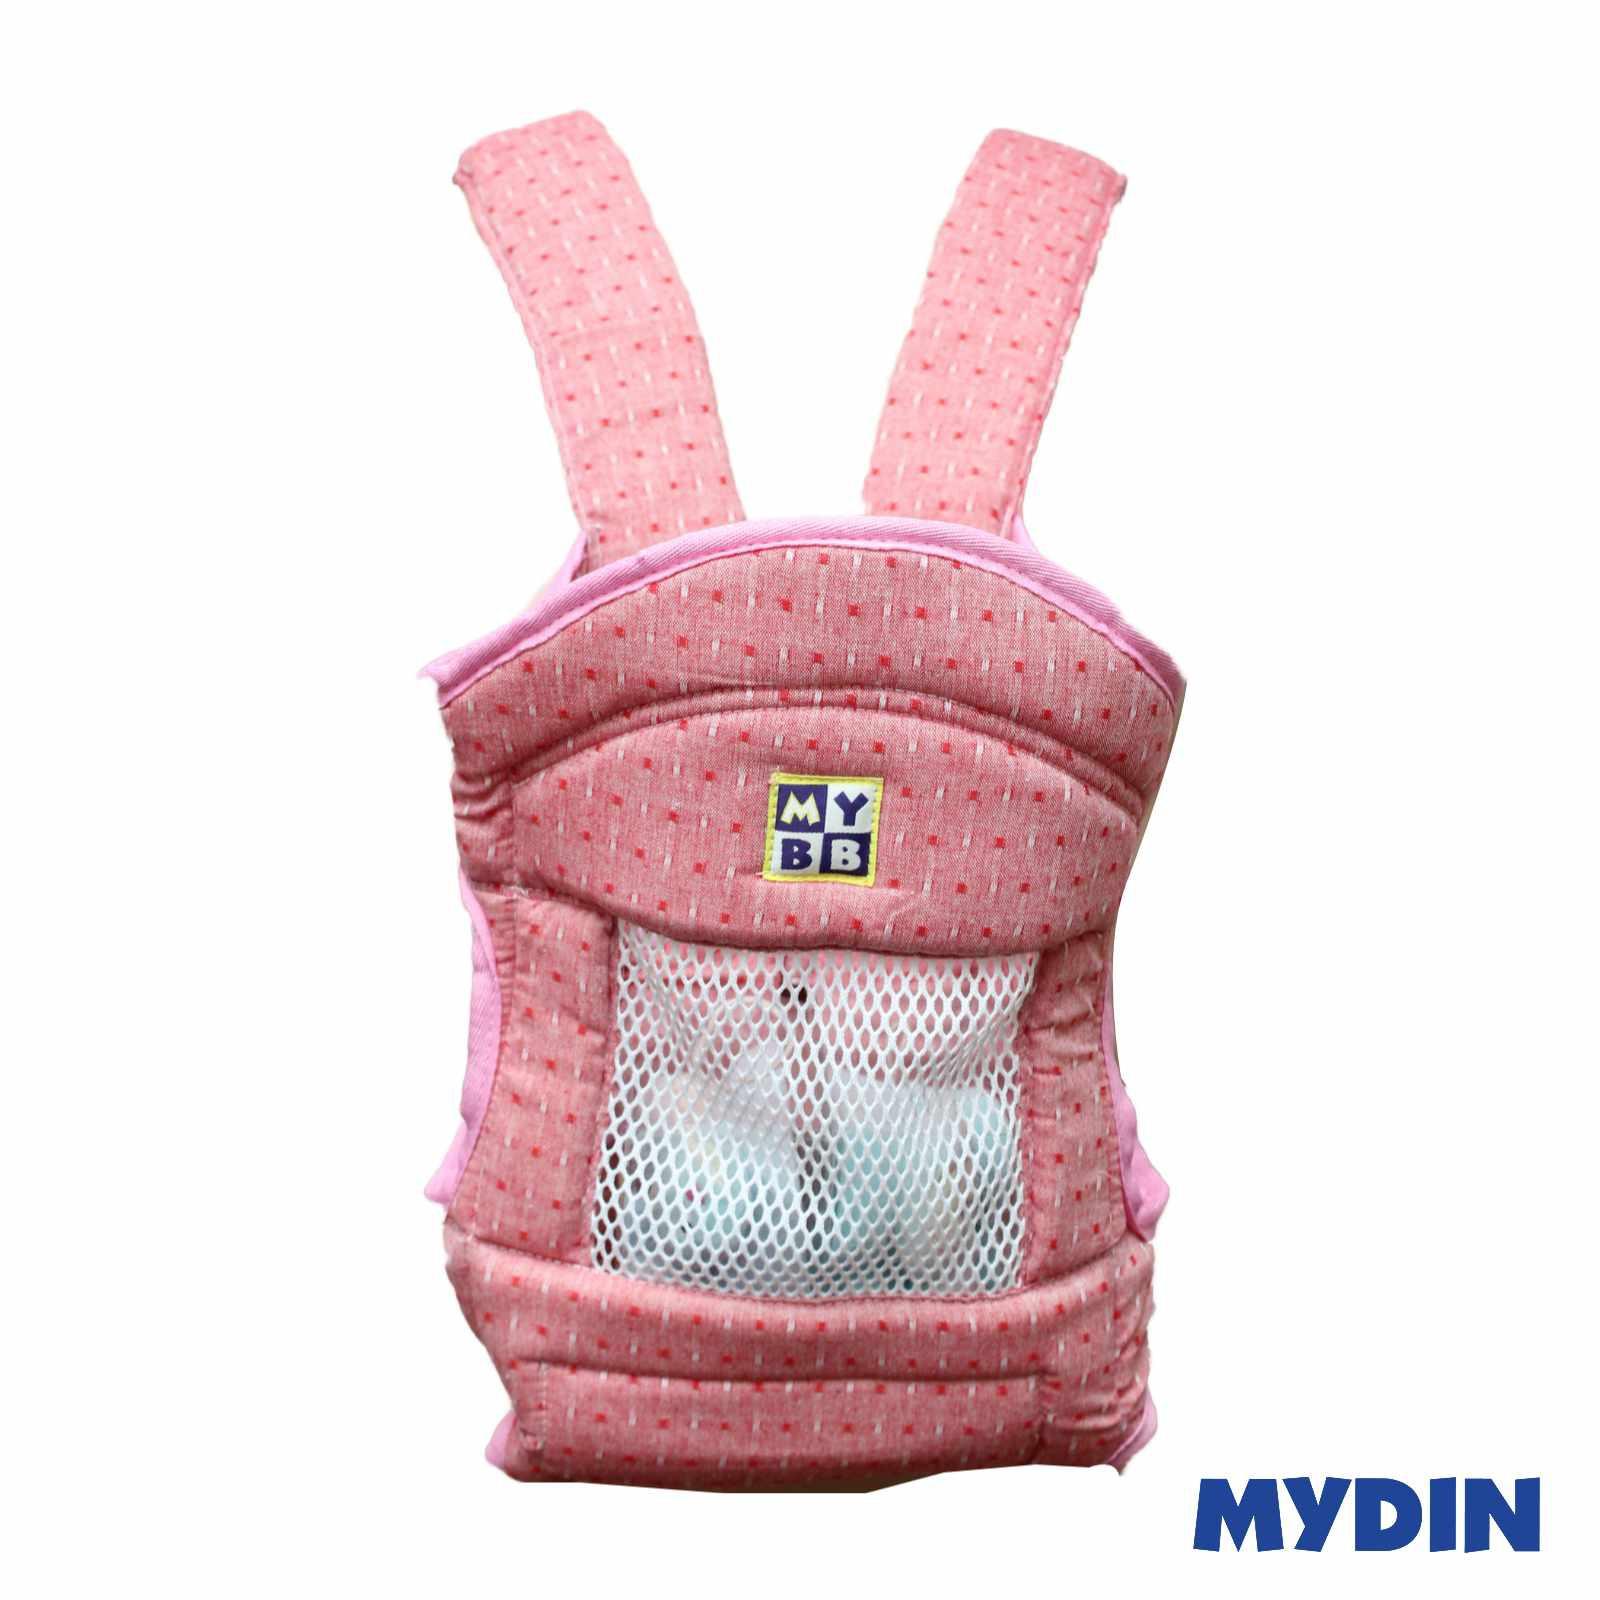 MYBB Baby Carrier 0319CBBDBPP01